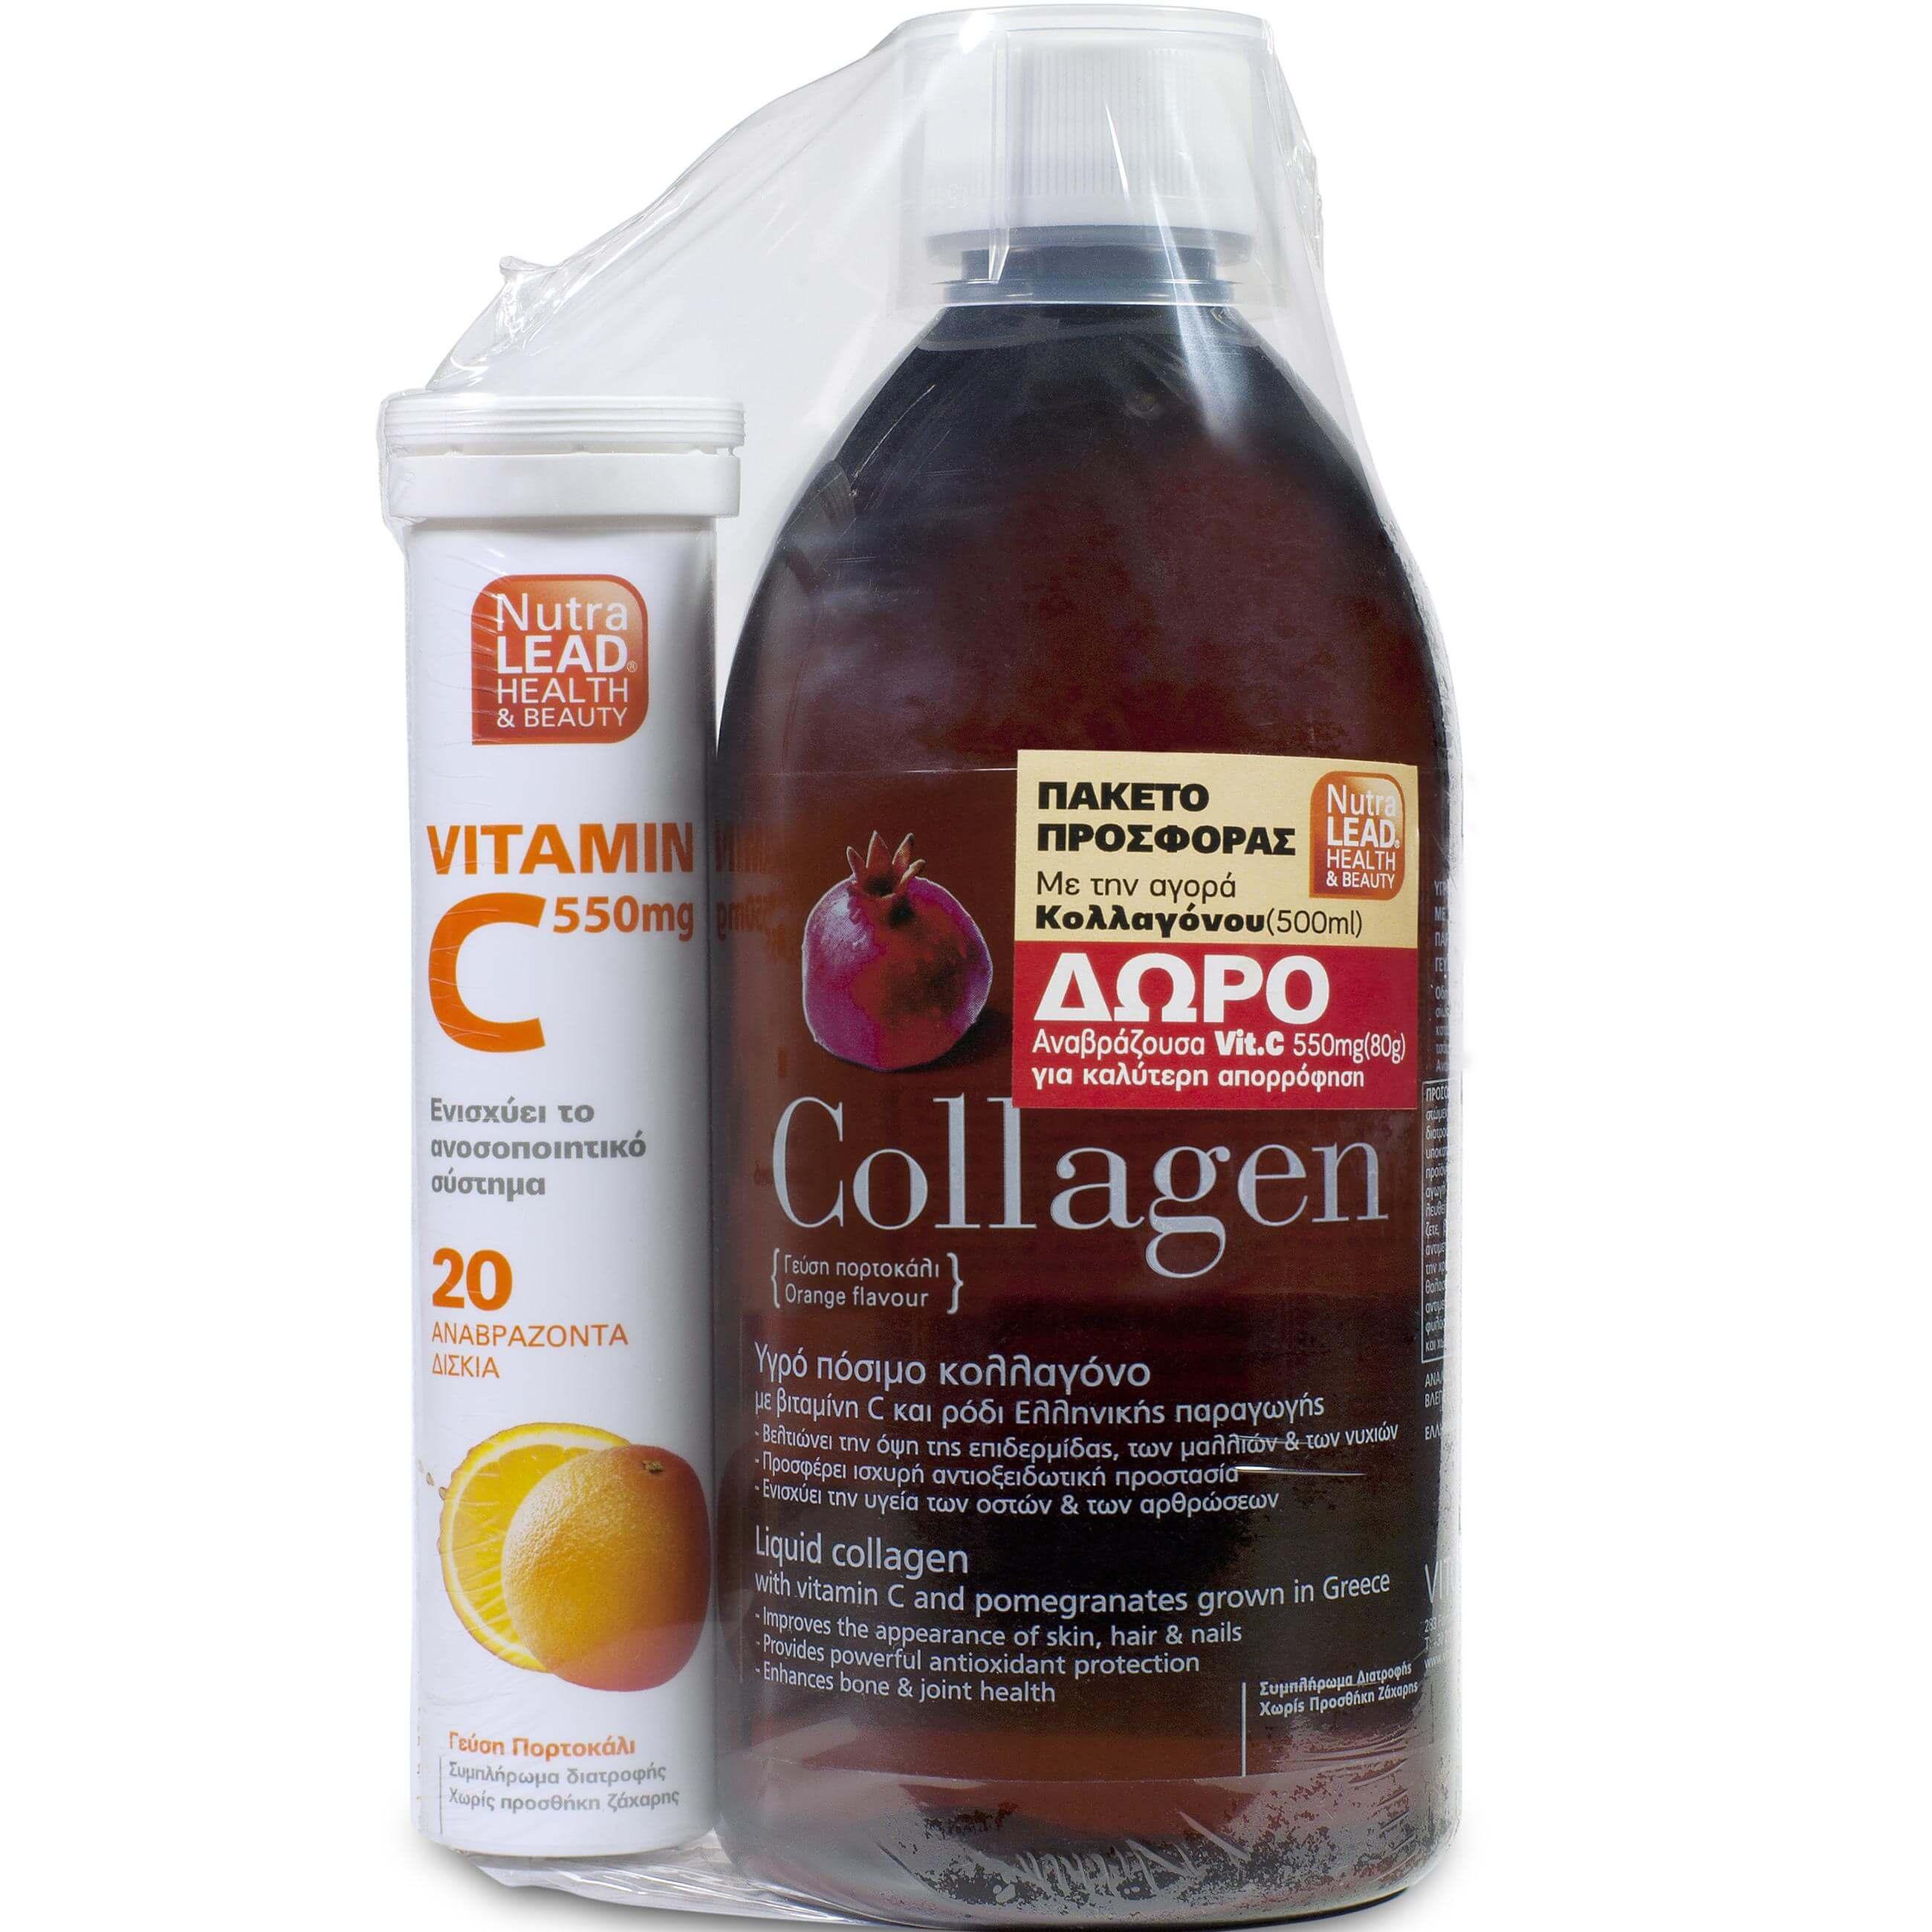 Nutralead Πόσιμο Κολλαγόνο (collagen) Με Ρόδι 500ml + ΔΩΡΟ Nutralead Vitamin C 550mg 20Αναβρ.Δισκία